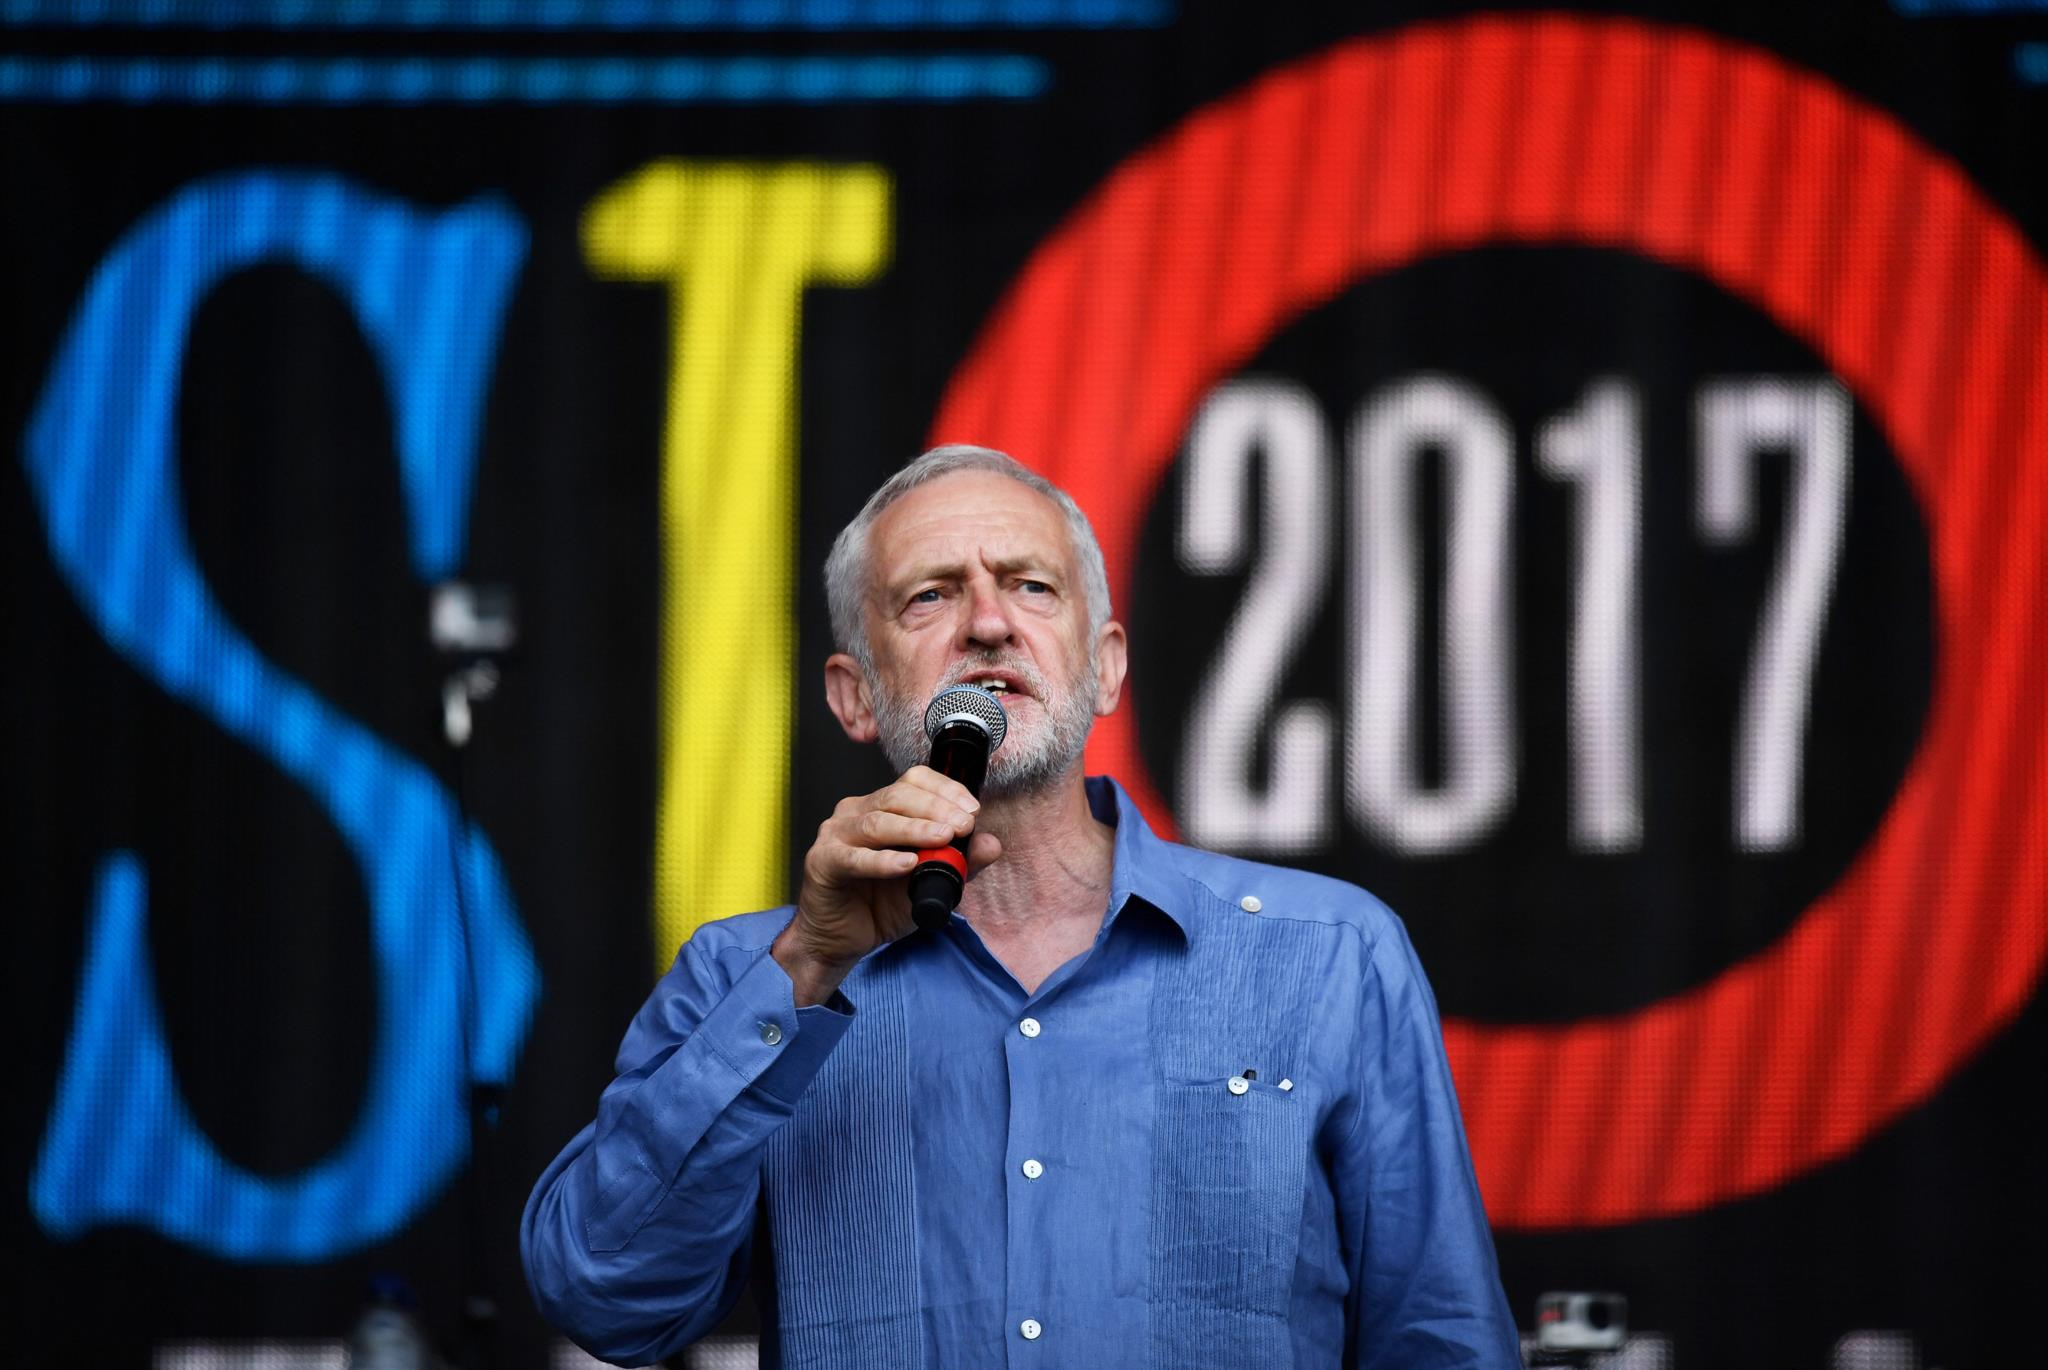 PÚBLICO - Ao segundo dia Glastonbury rendeu-se aos Foo Fighters e a… Jeremy Corbyn